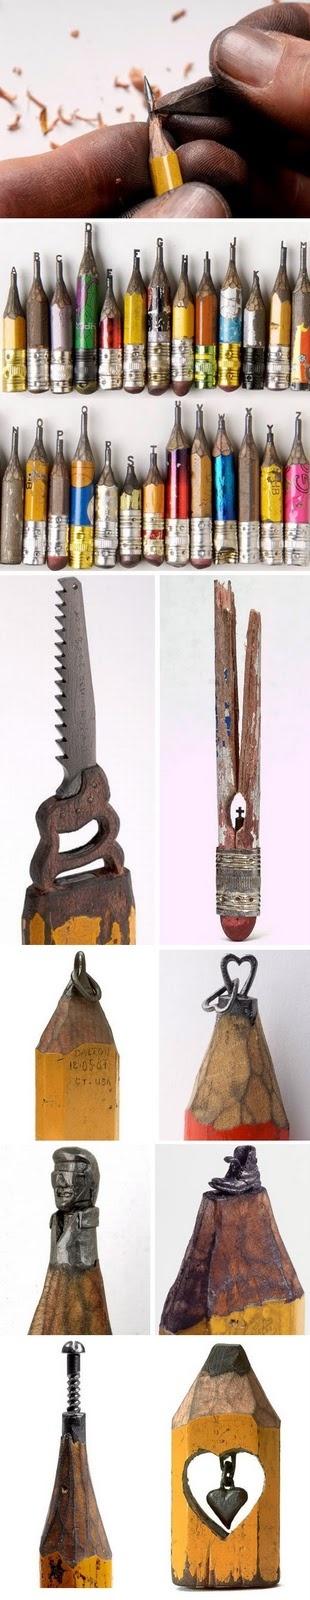 amazingg pencil carving!!